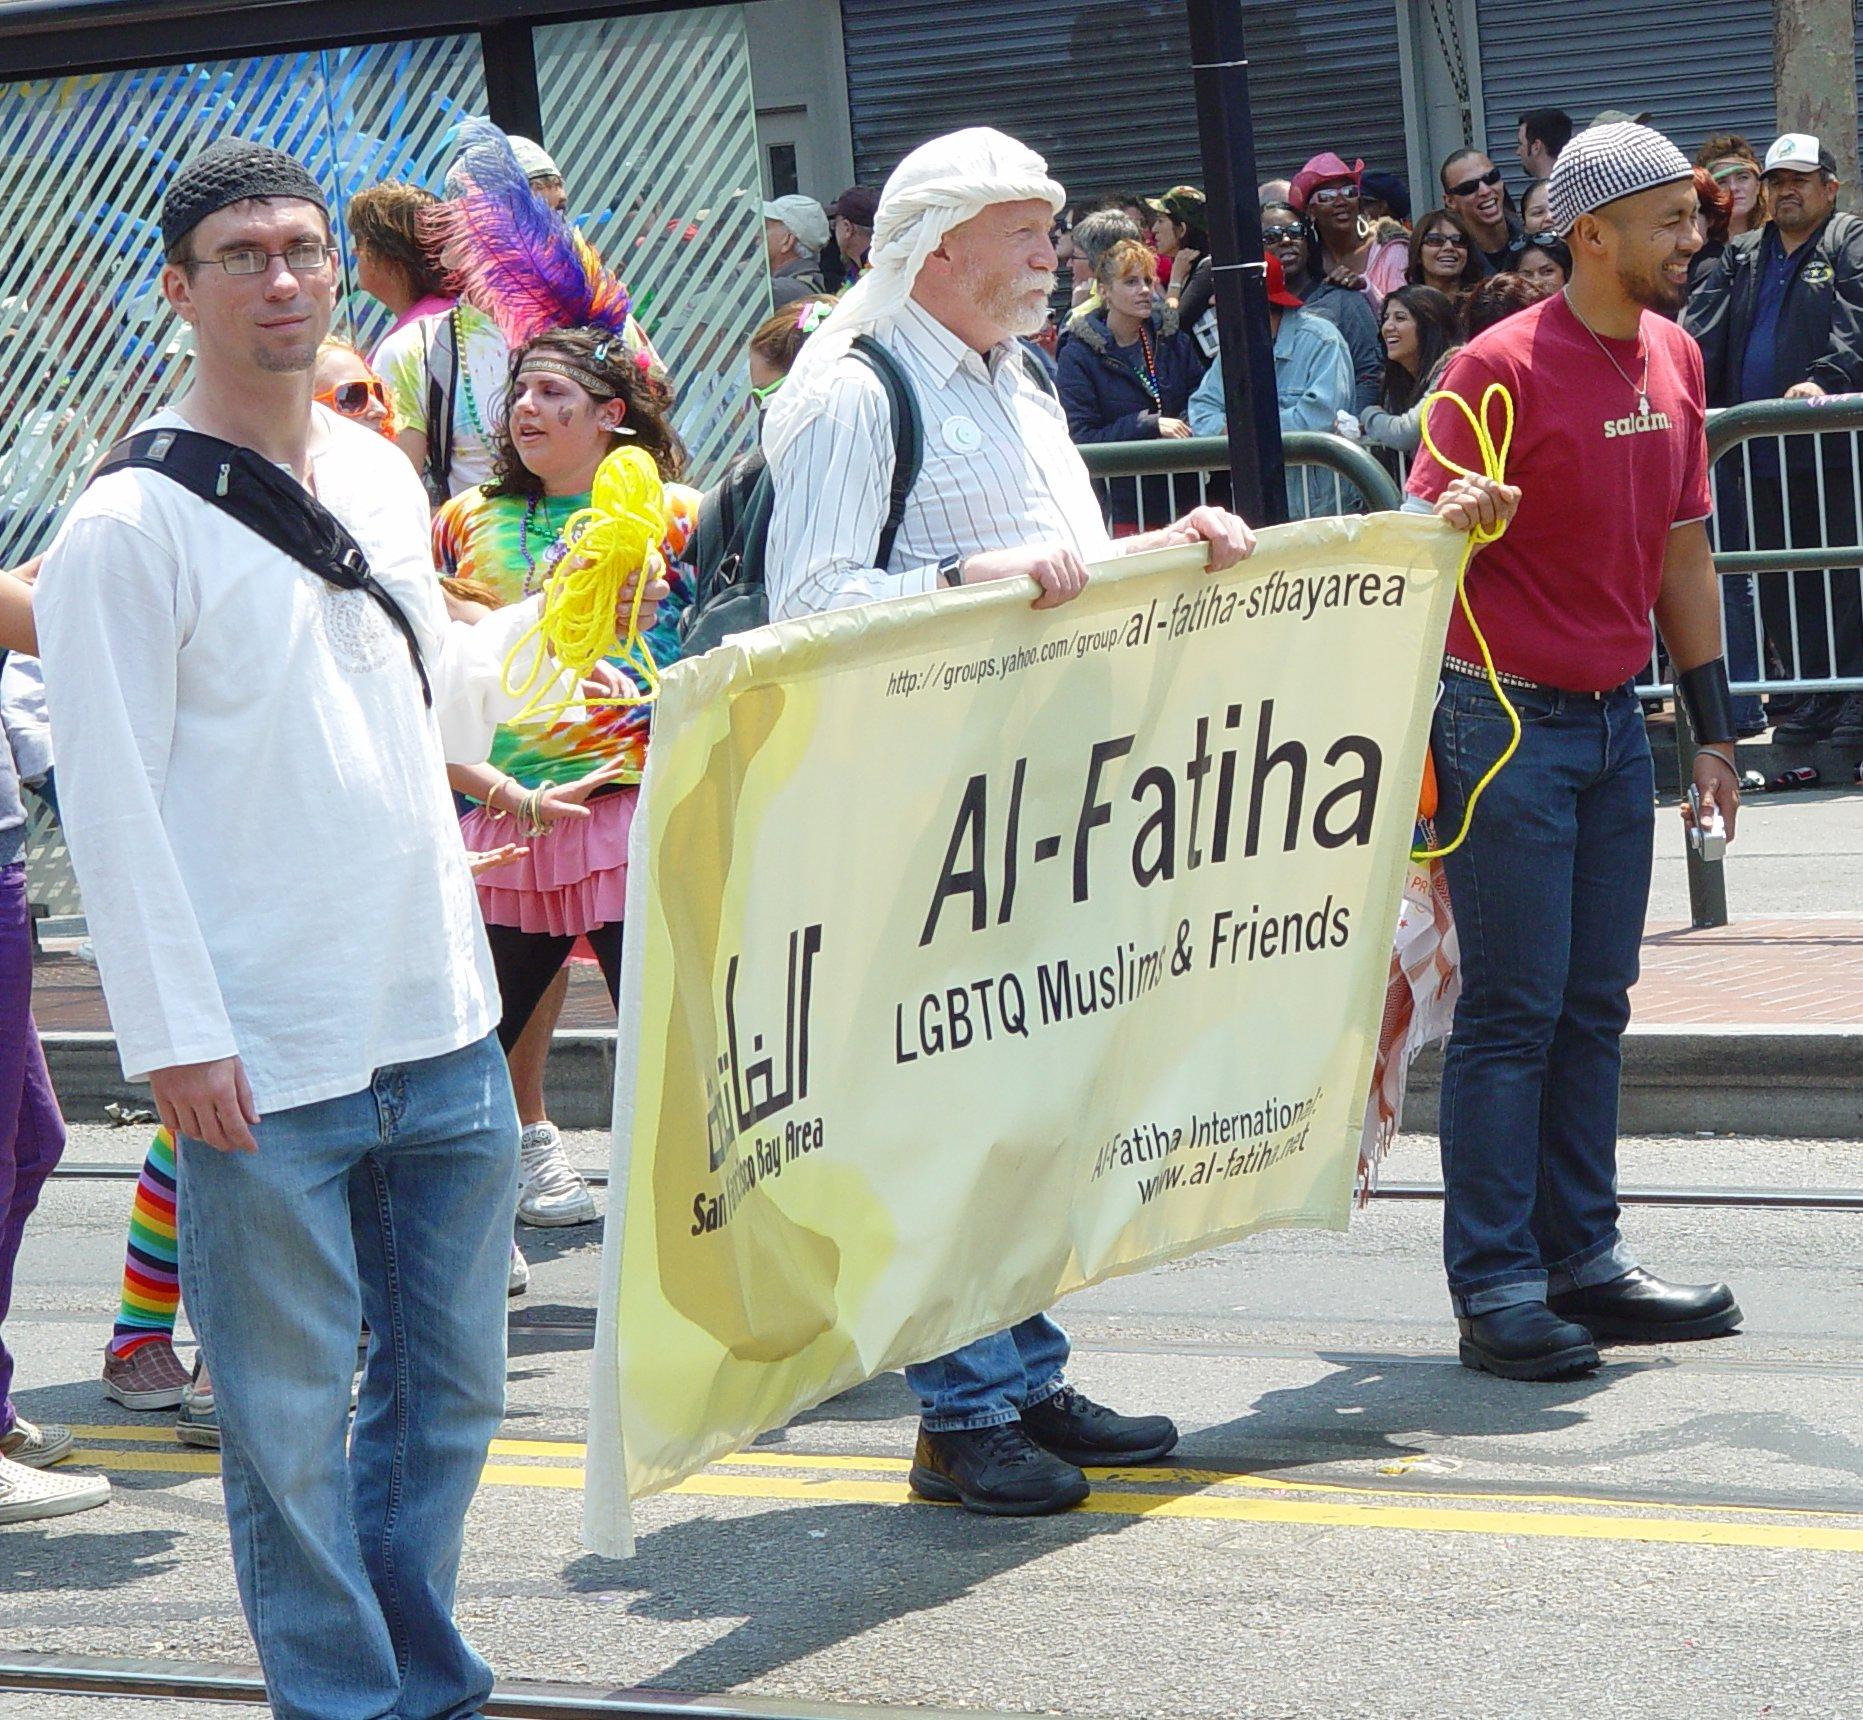 Дружба мусульман с гомосексуалами